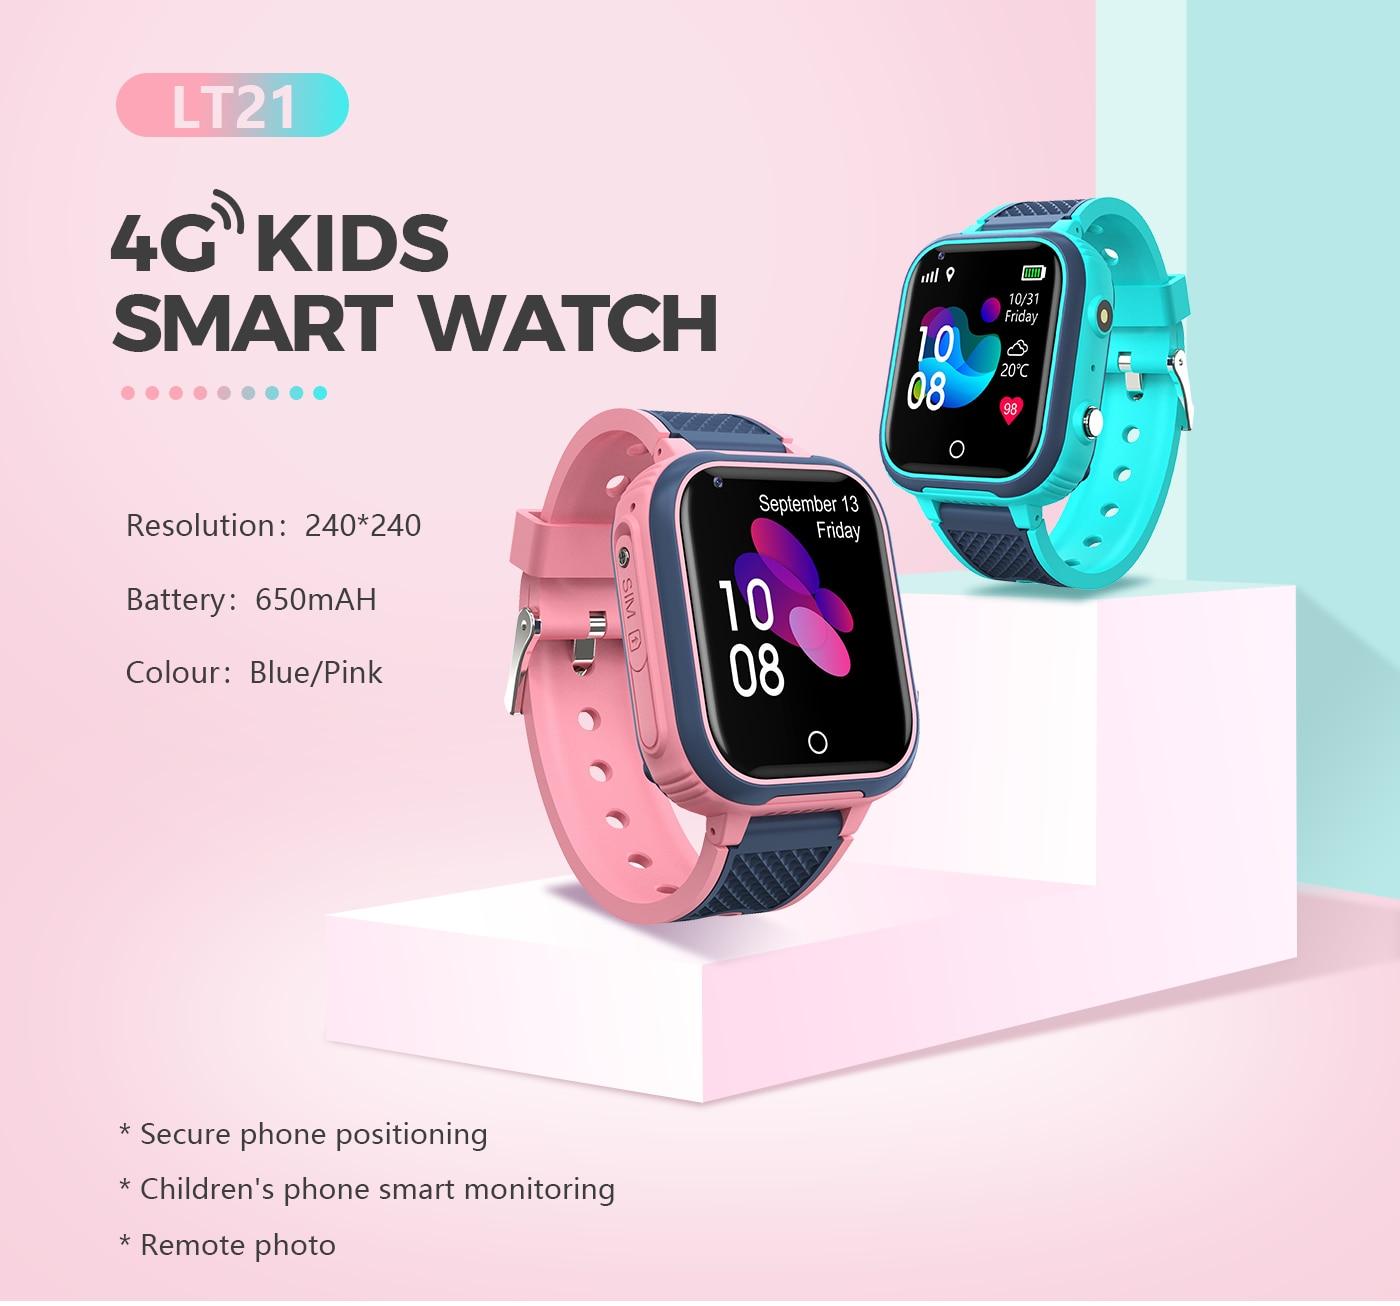 H8de26b44220c4168b1cd298868bfed5aI LT21 4G Smart Watch Kids GPS WIFI Video Call SOS IP67 Waterproof Child Smartwatch Camera Monitor Tracker Location Phone Watch